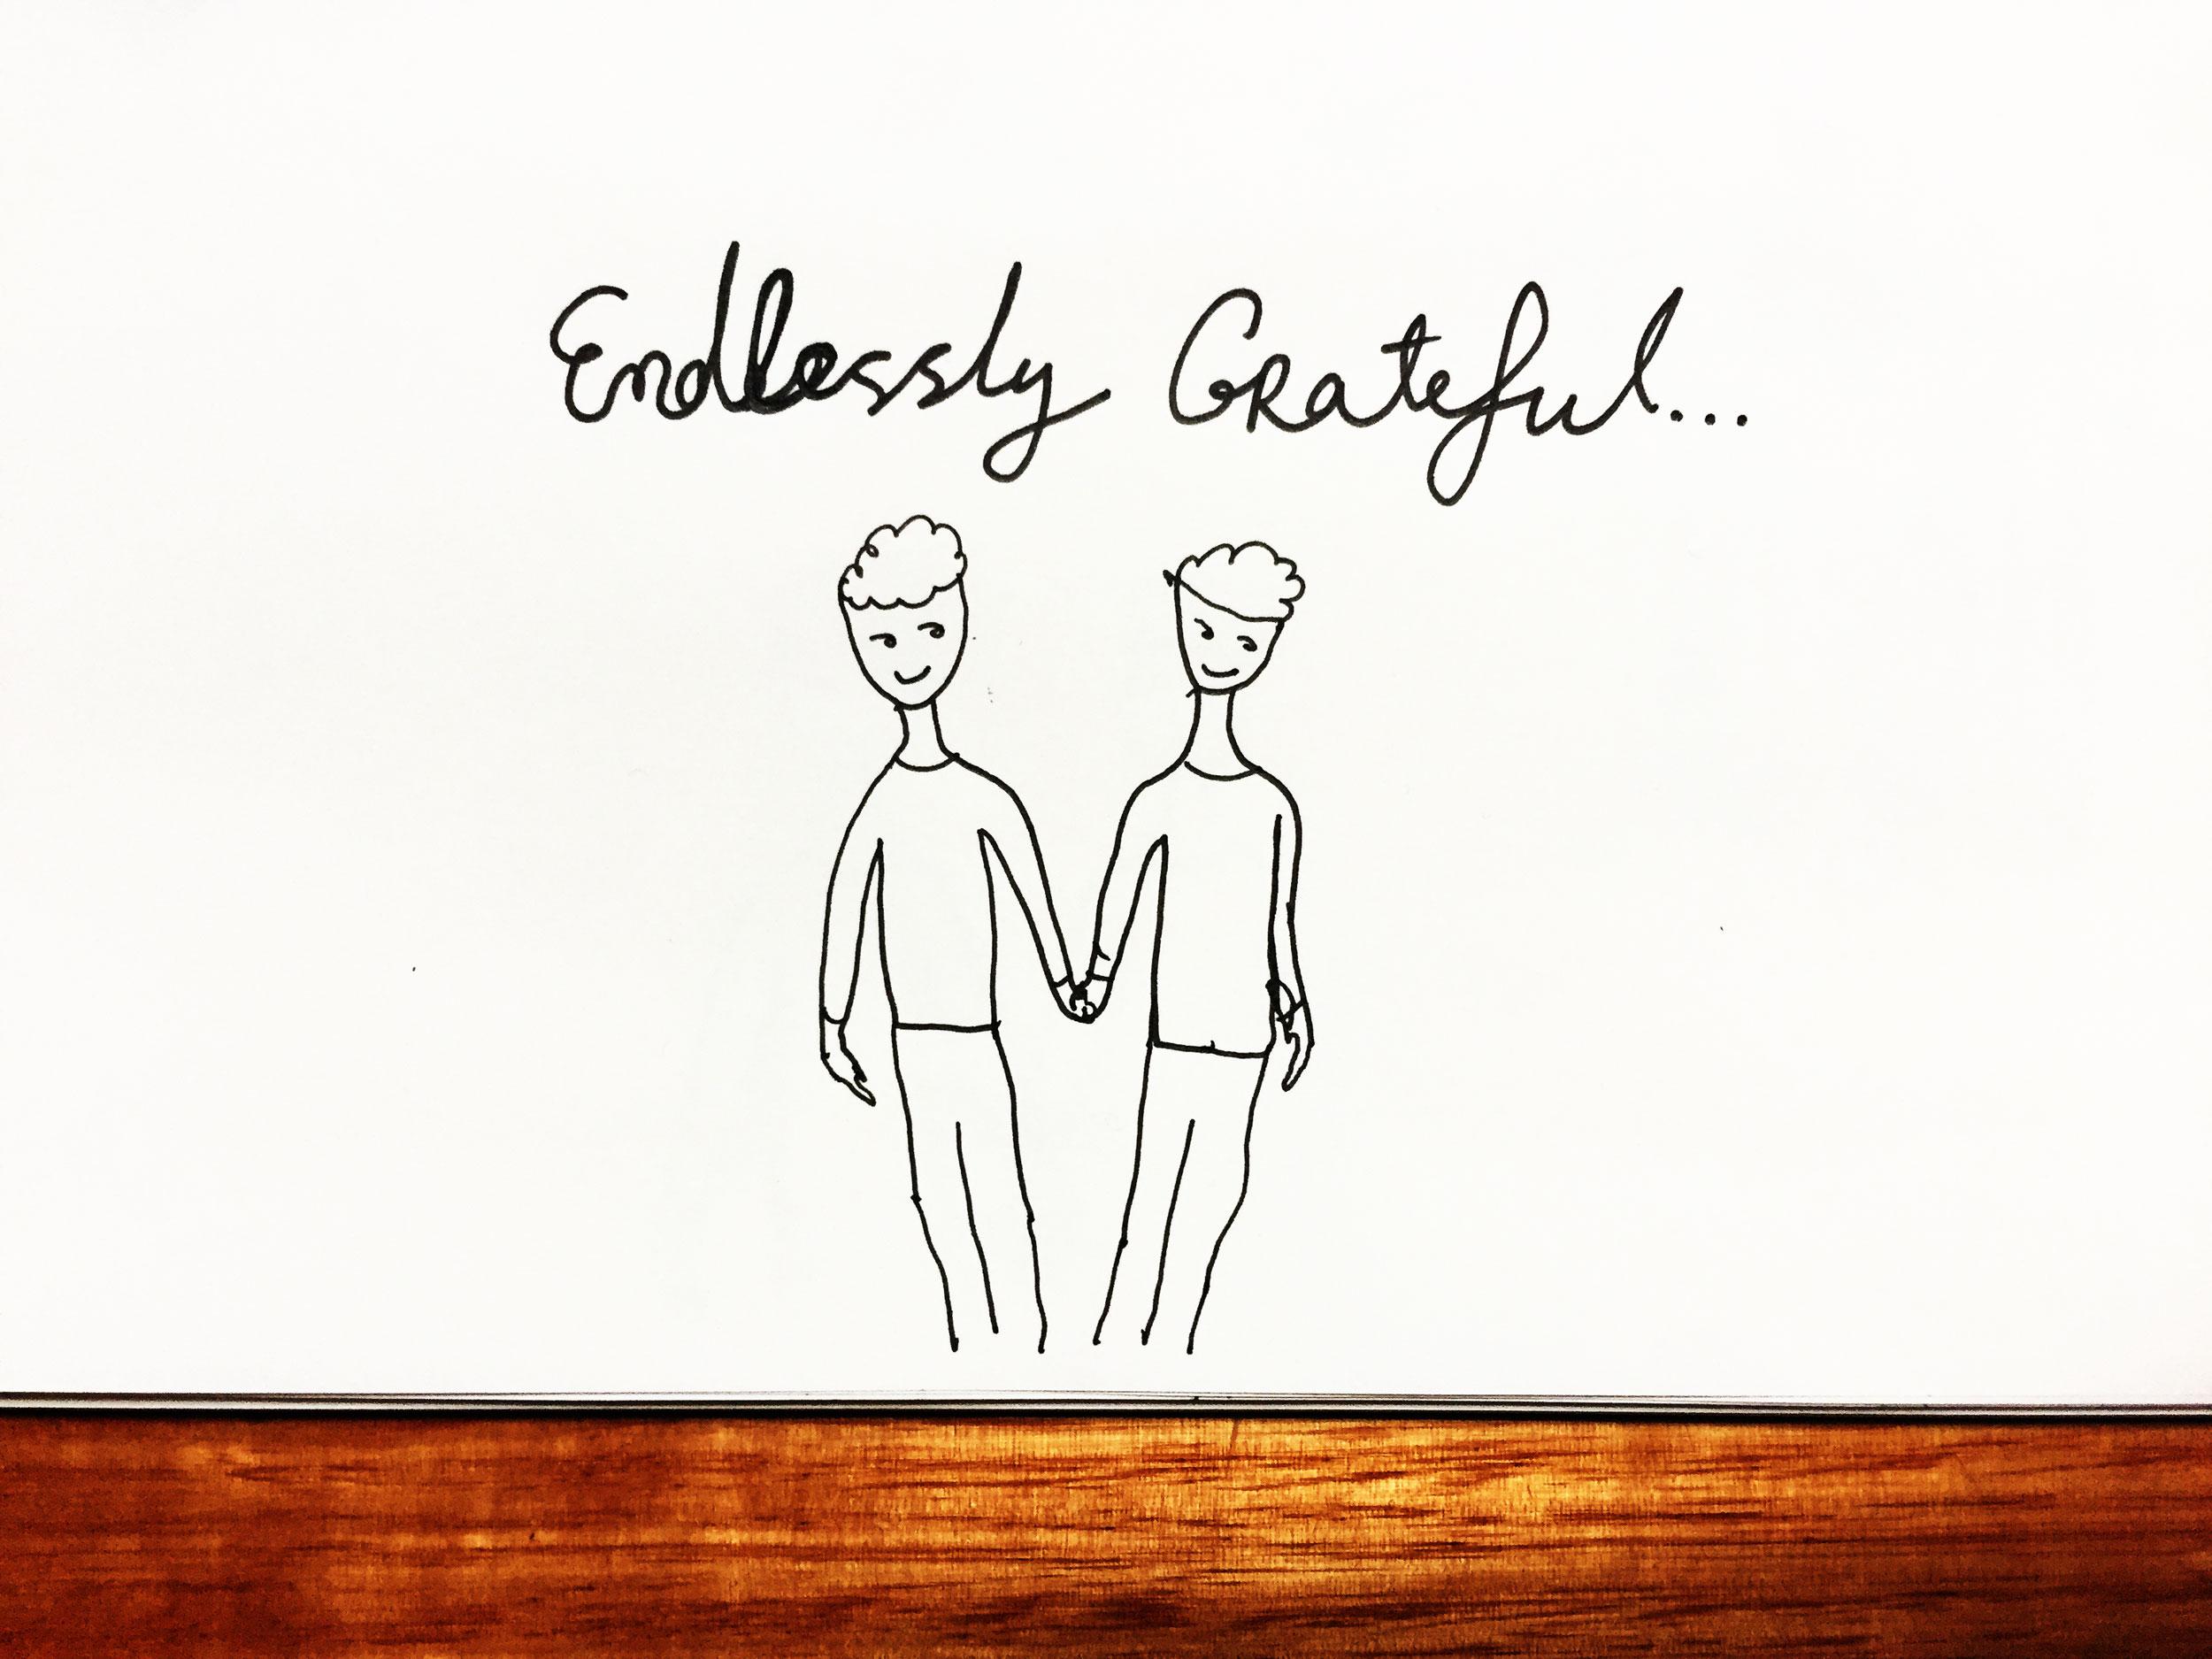 Endlessly grateful. Drawing Luke Hockley.